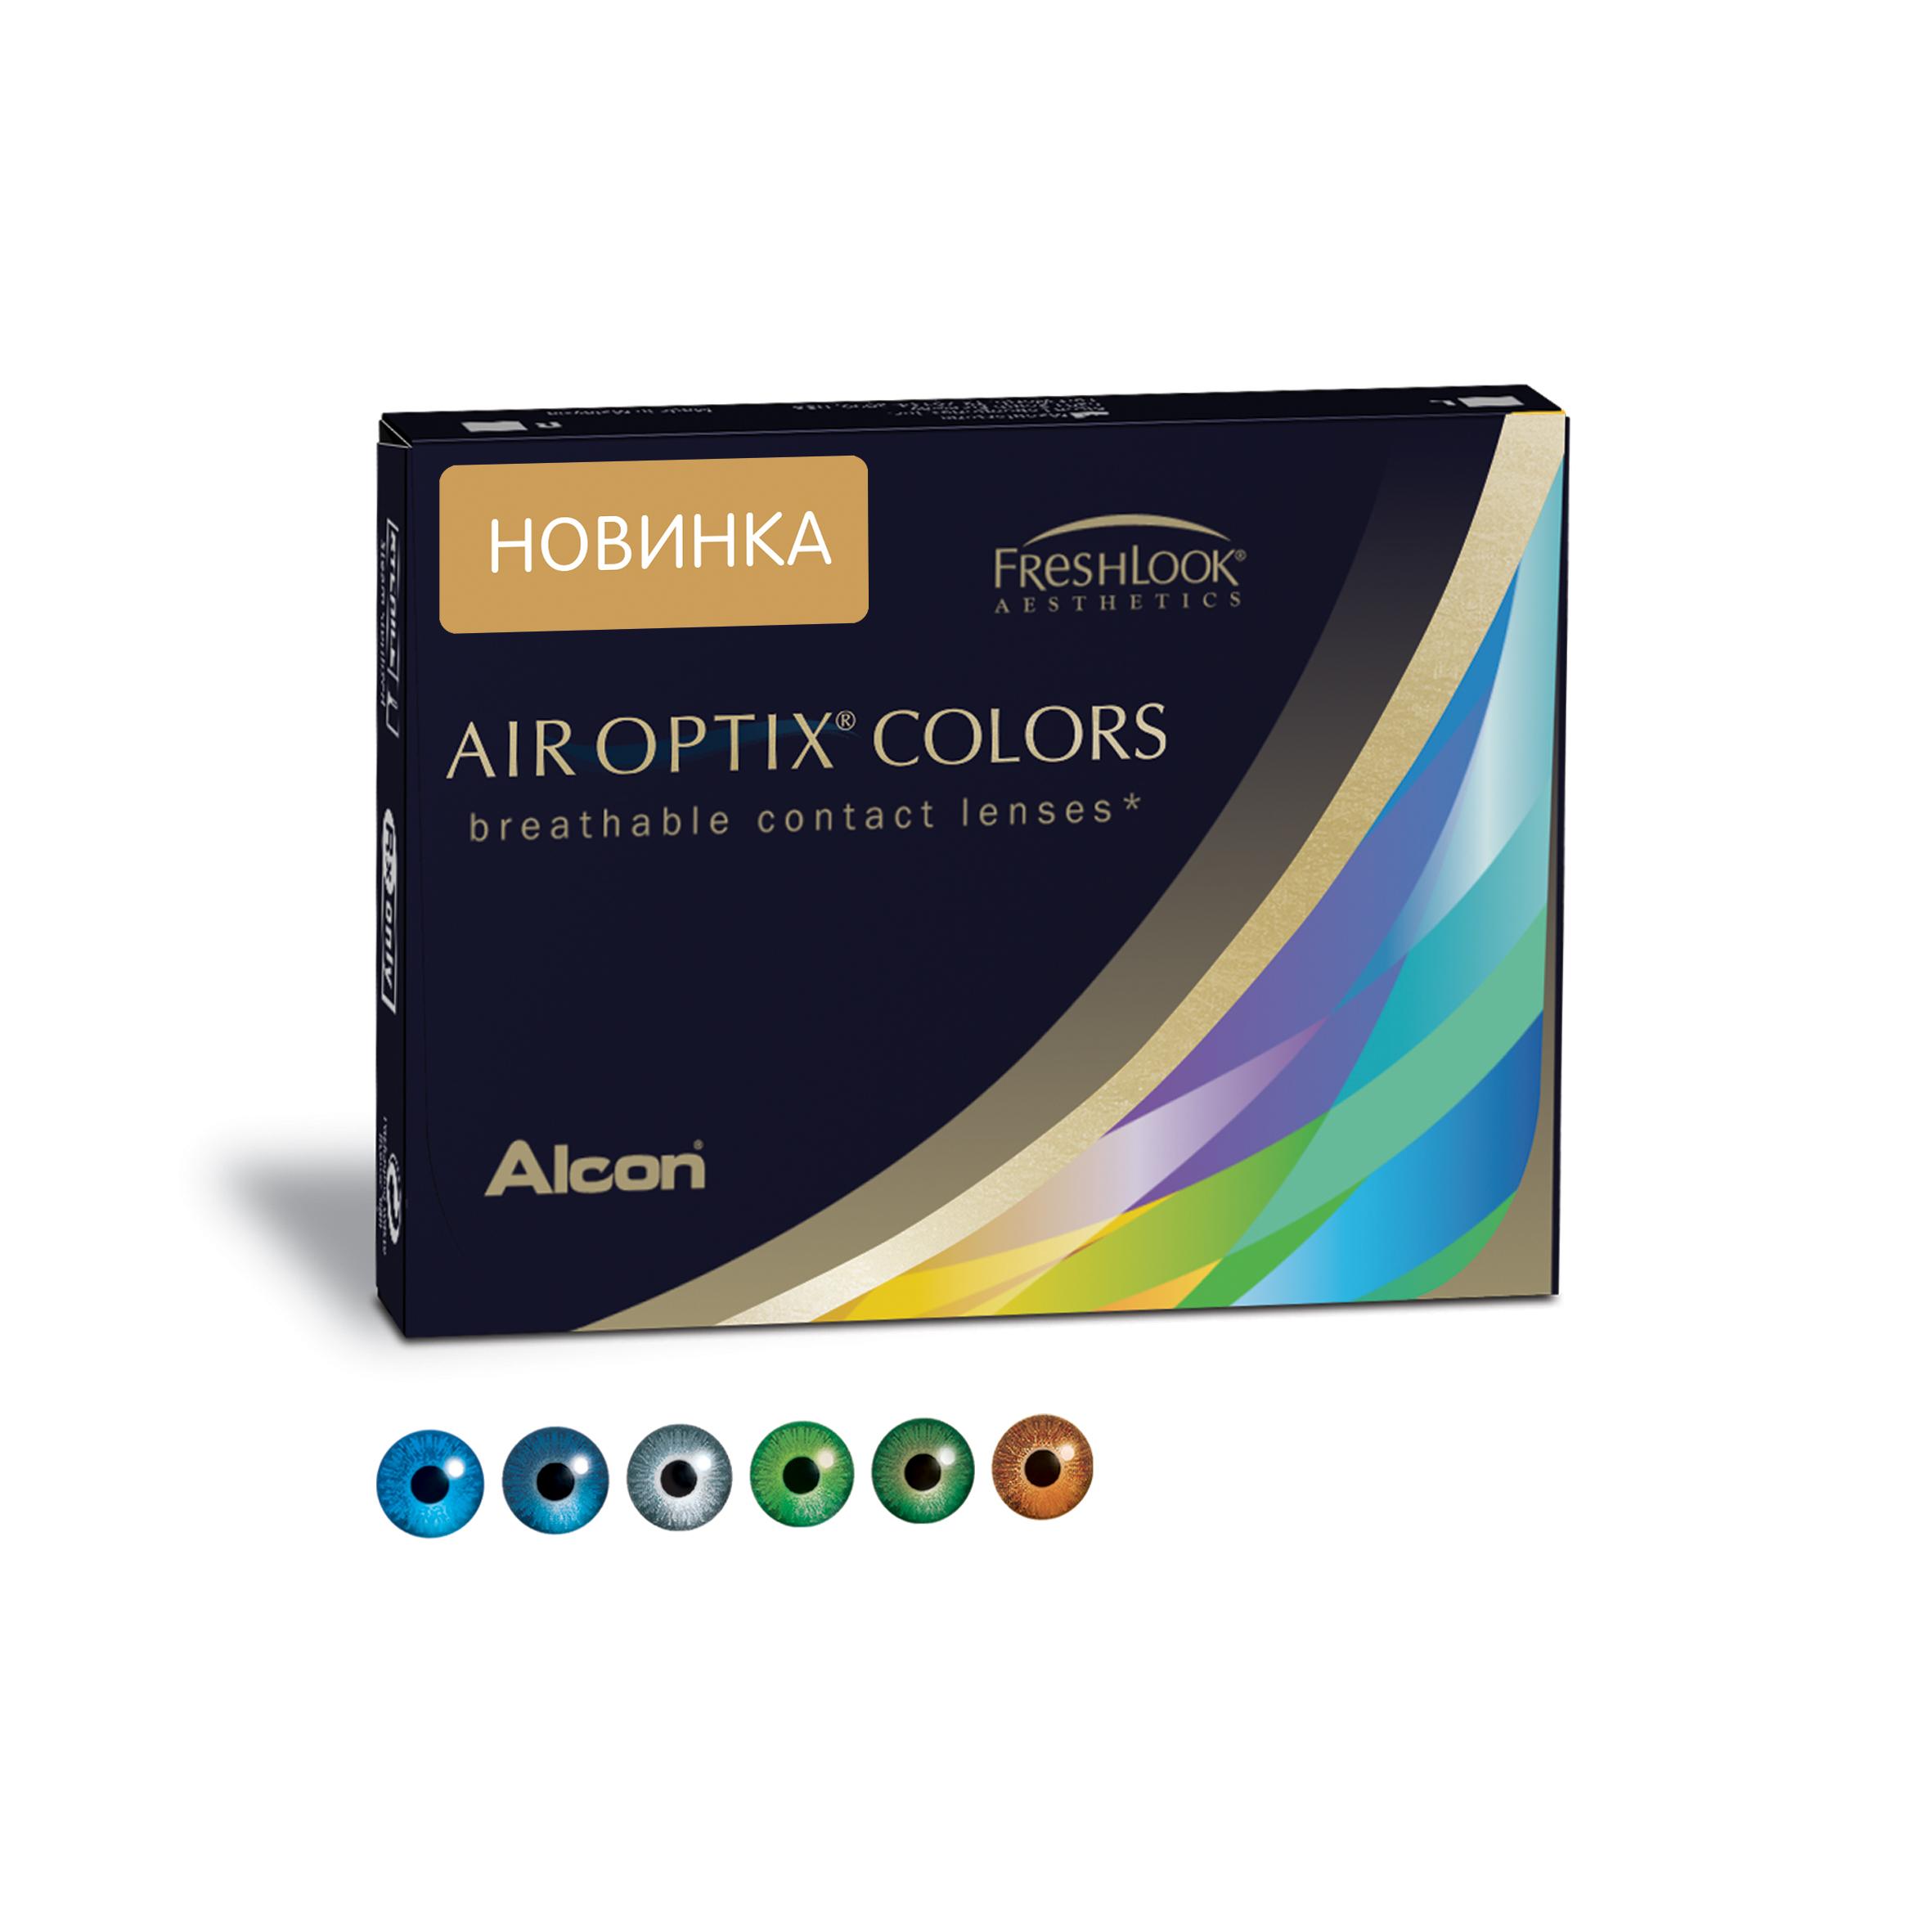 Аlcon контактные линзы Air Optix Colors 2 шт -1.75 Blue